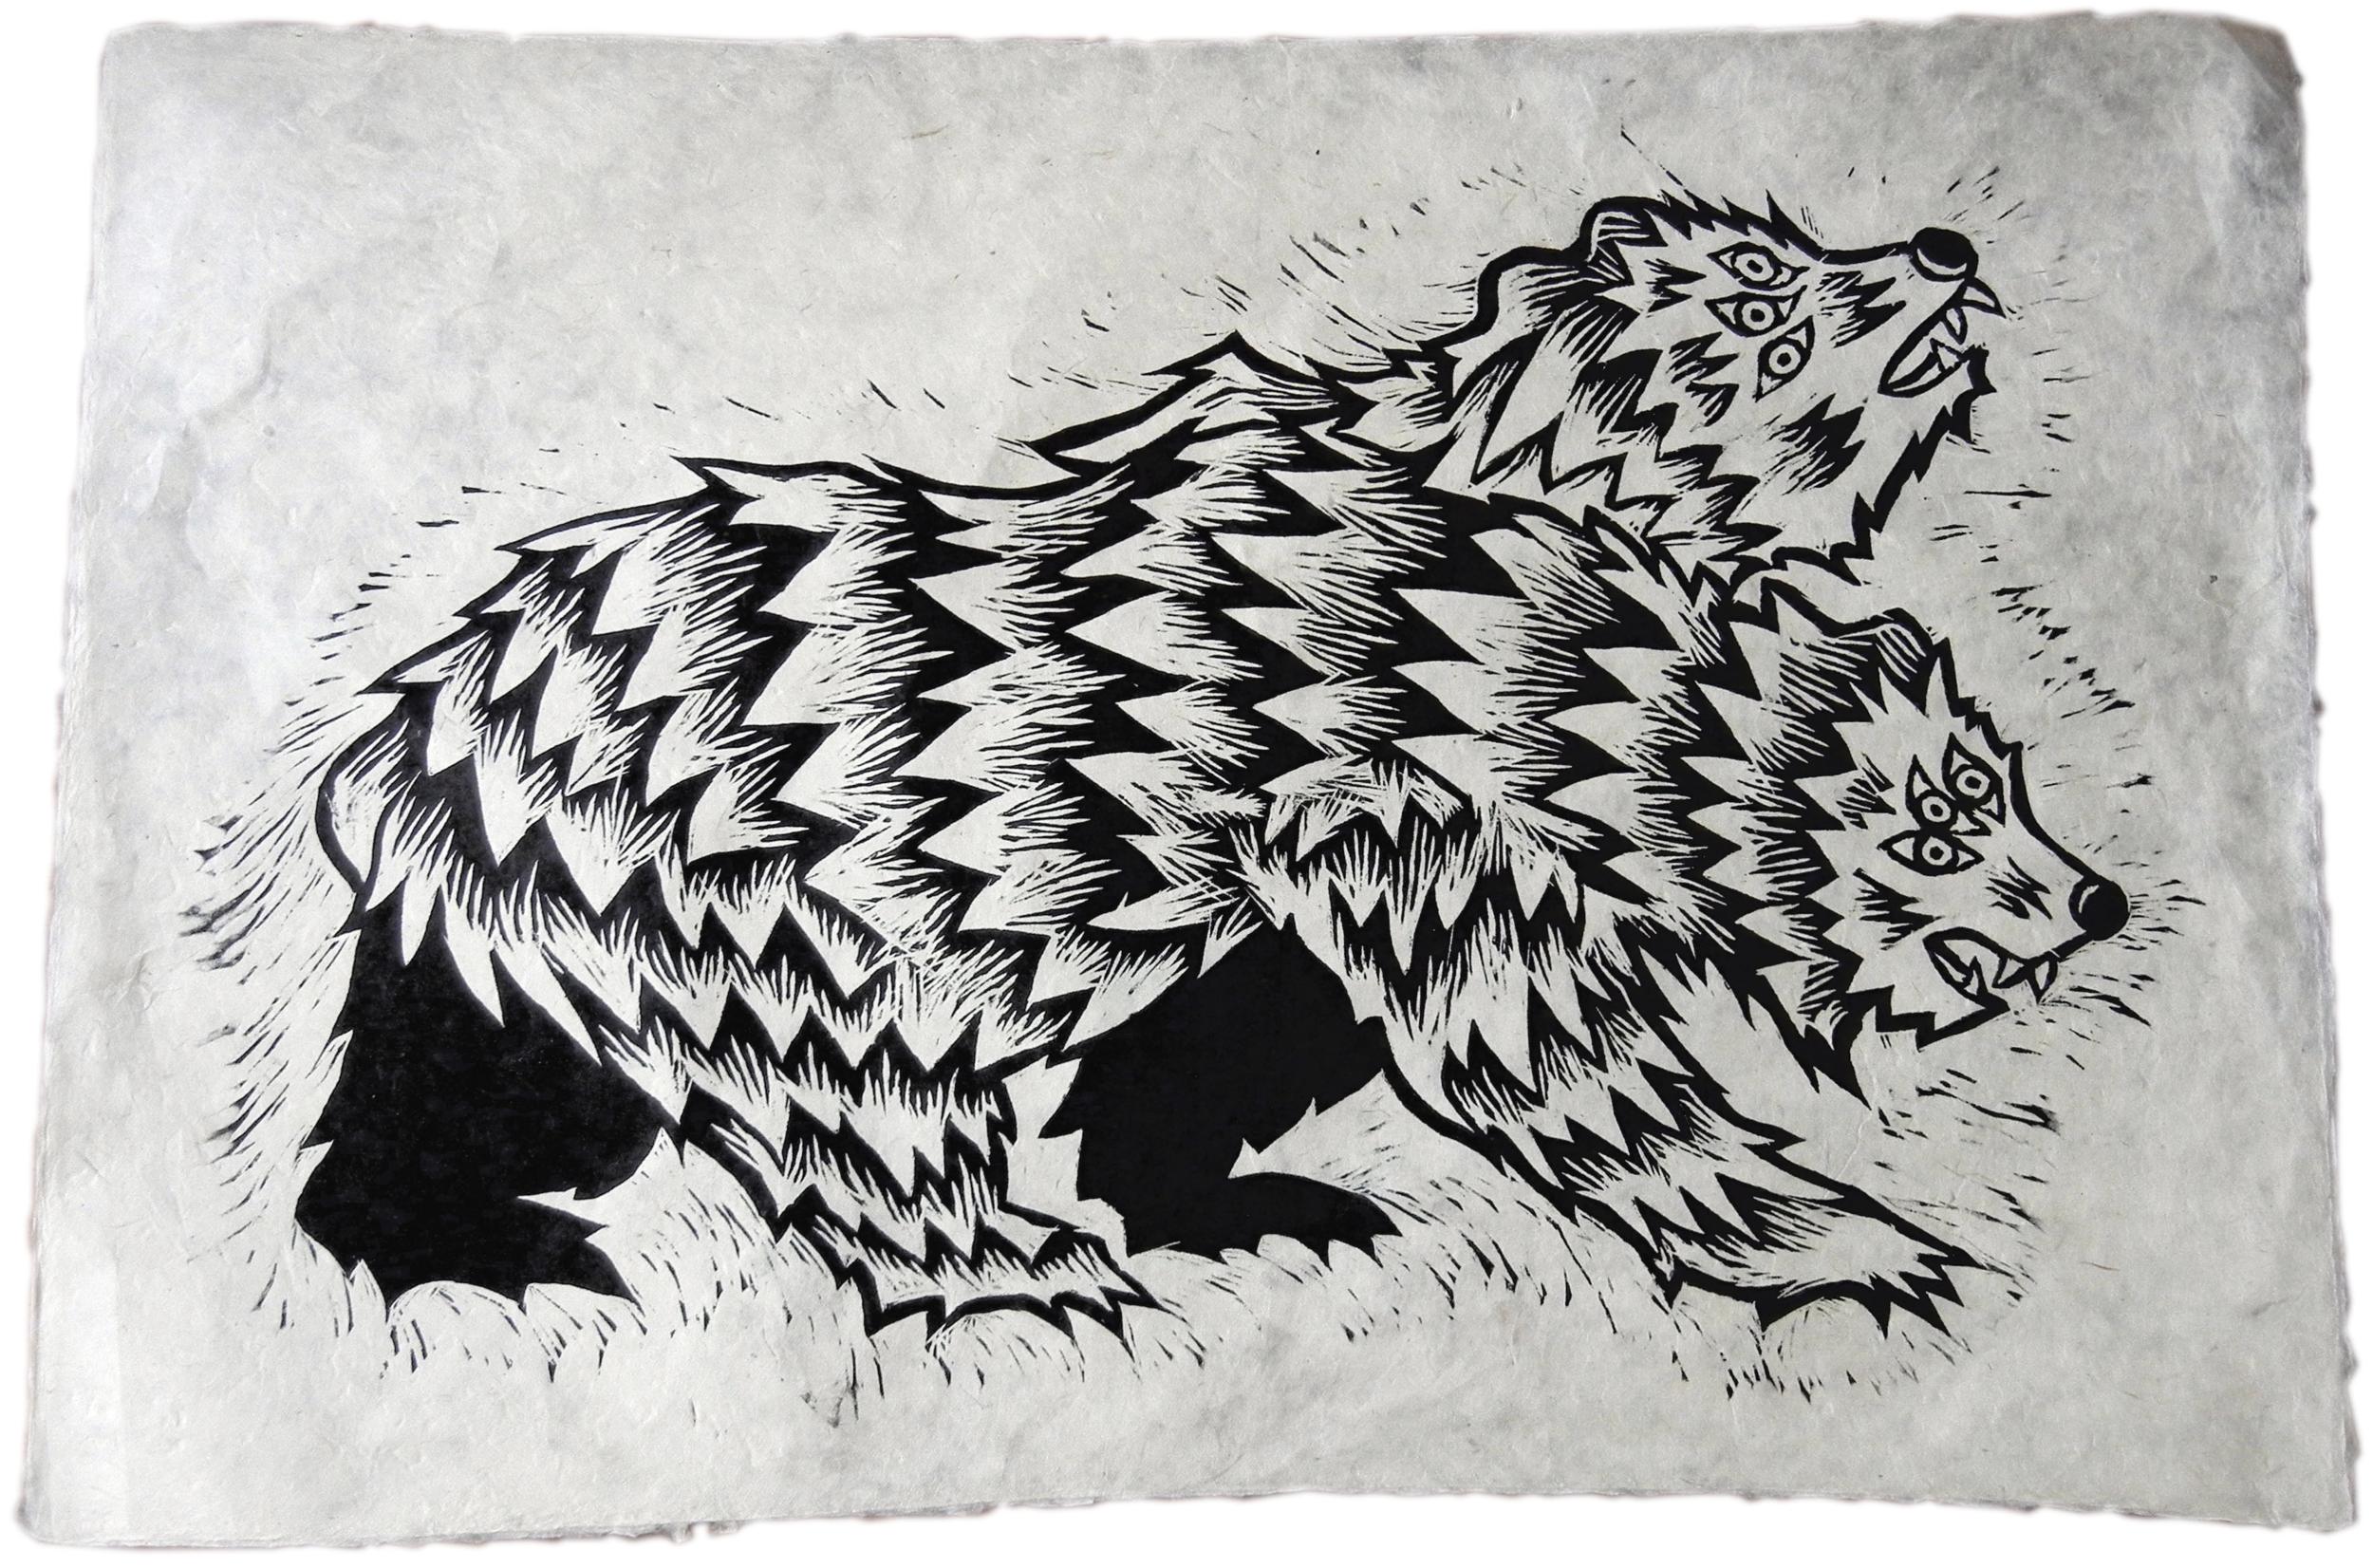 Jake Cassevoy Untitled #2 Woodblock Print $100.